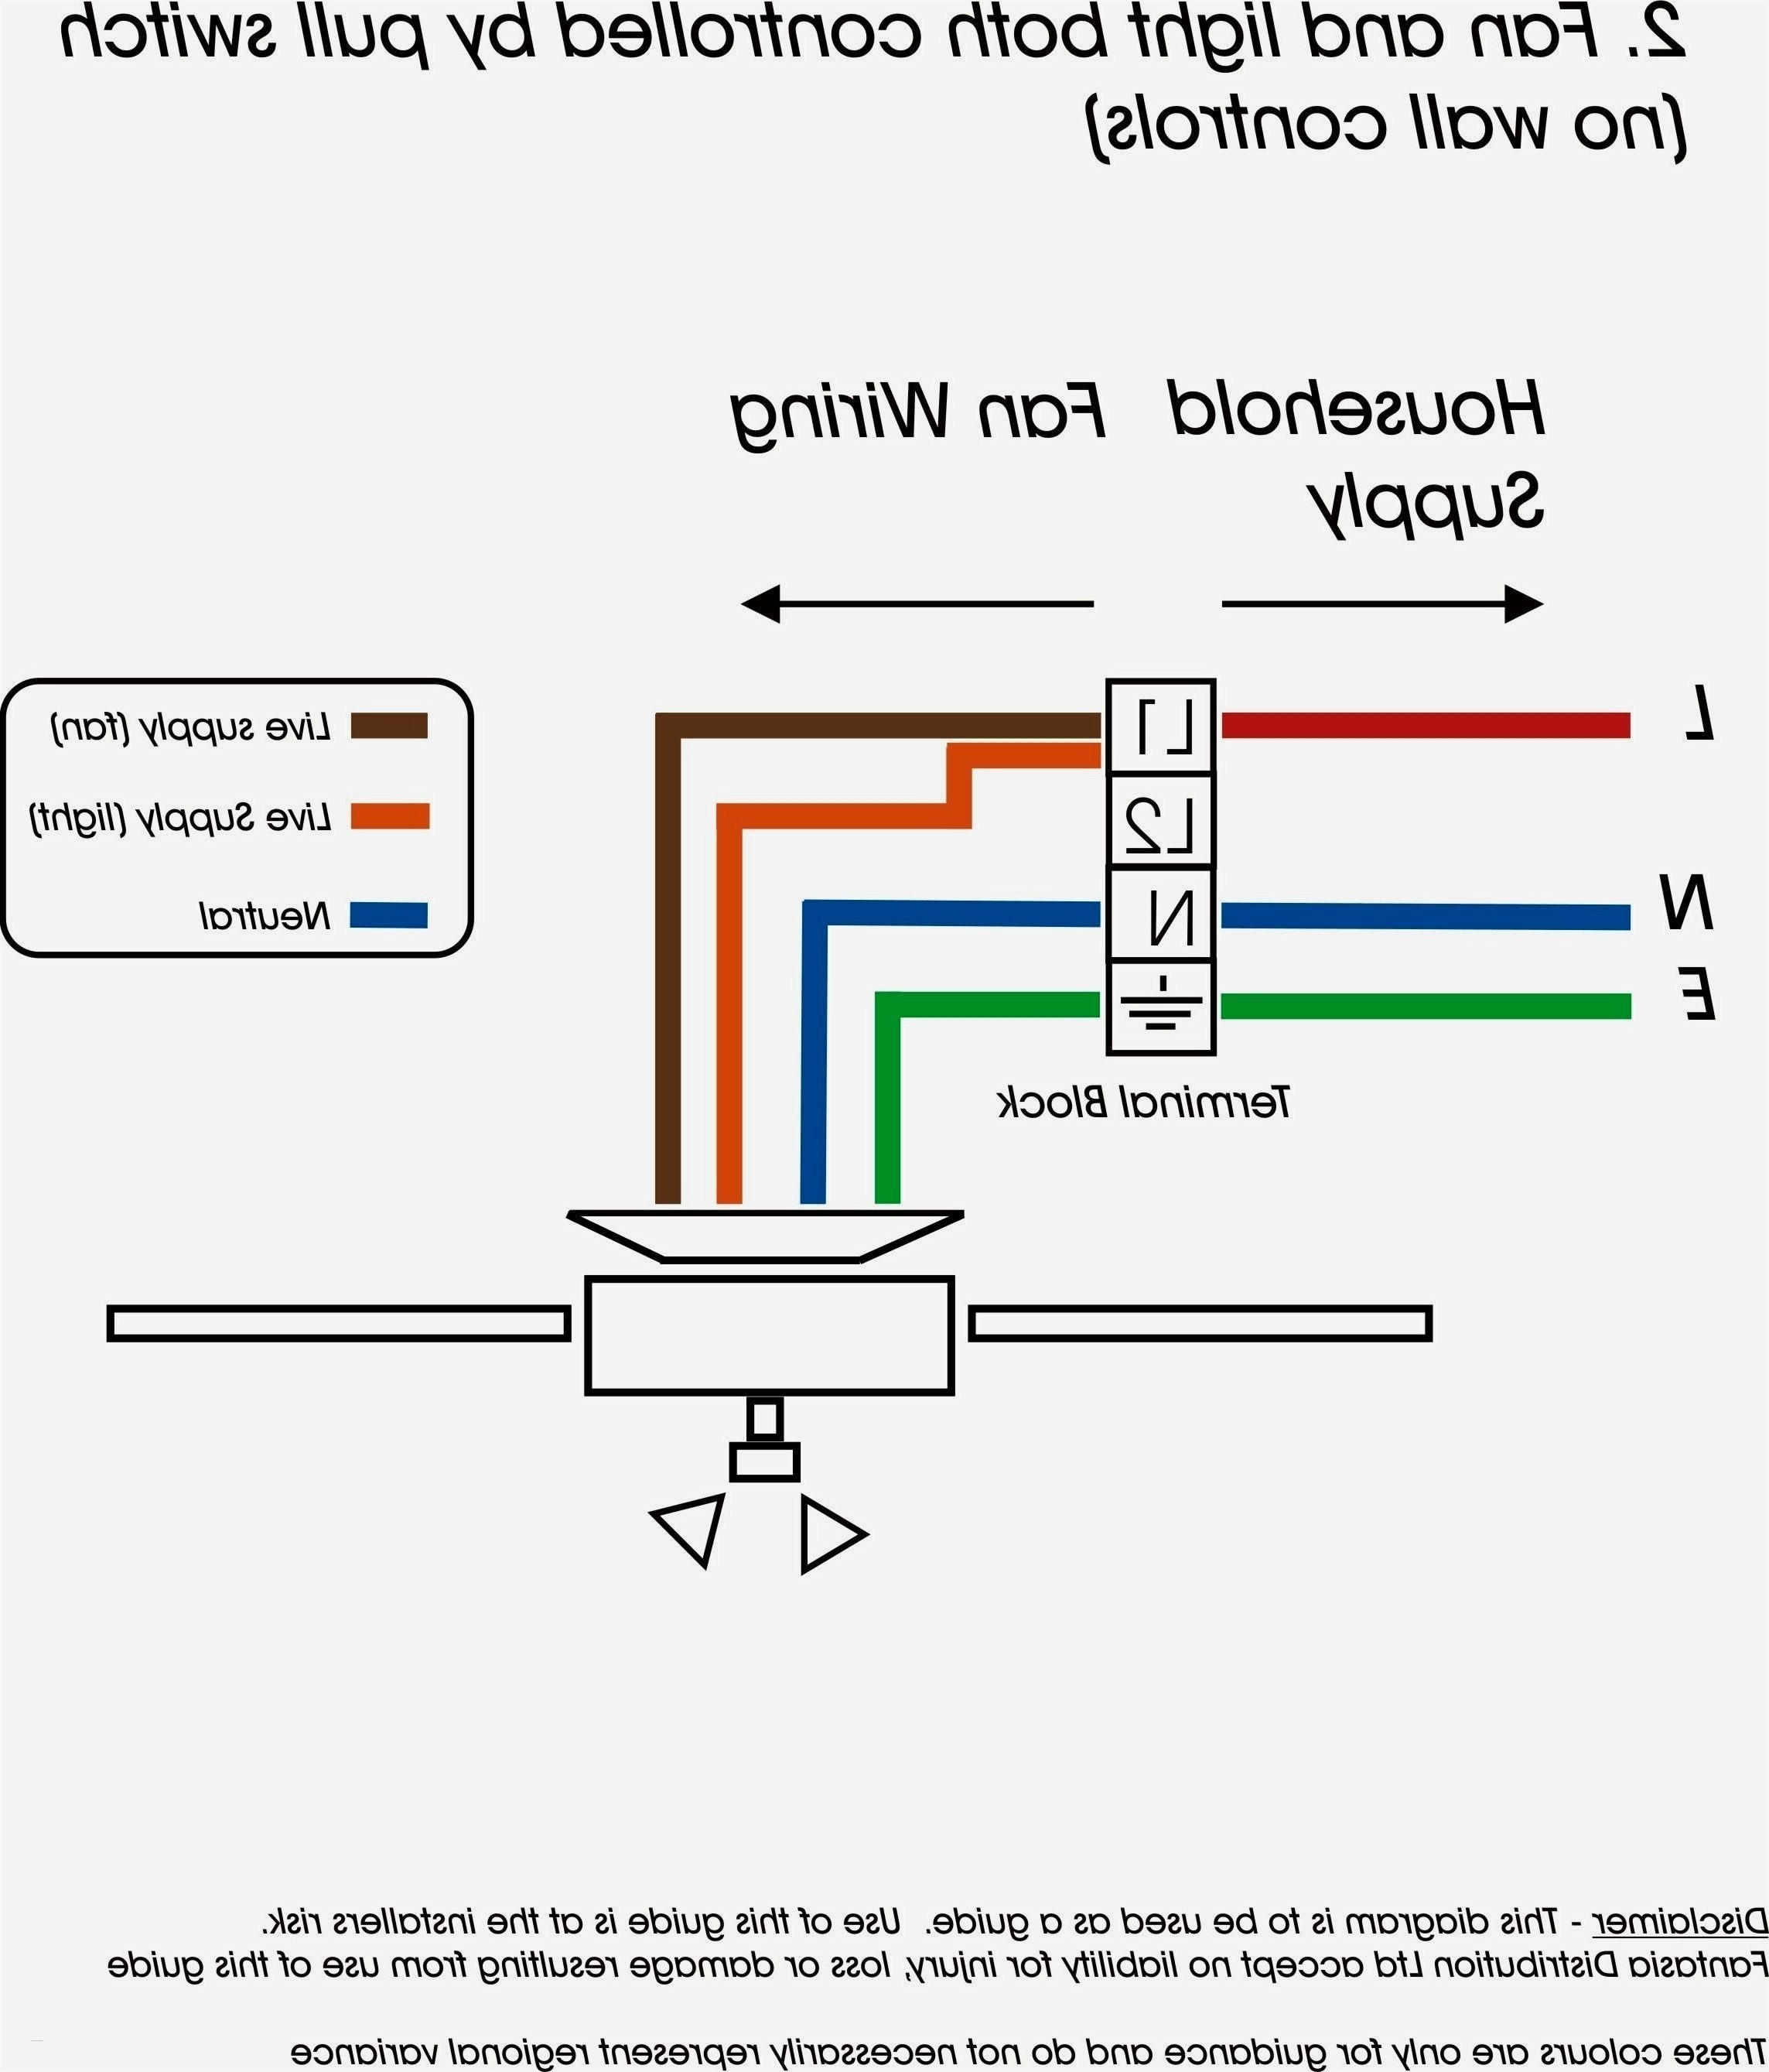 30 Amp Twist Lock Plug Wiring Diagram Wiring Diagram 30 Amp Plug New 20 Amp Twist Lock Plug Wiring Diagram Of 30 Amp Twist Lock Plug Wiring Diagram